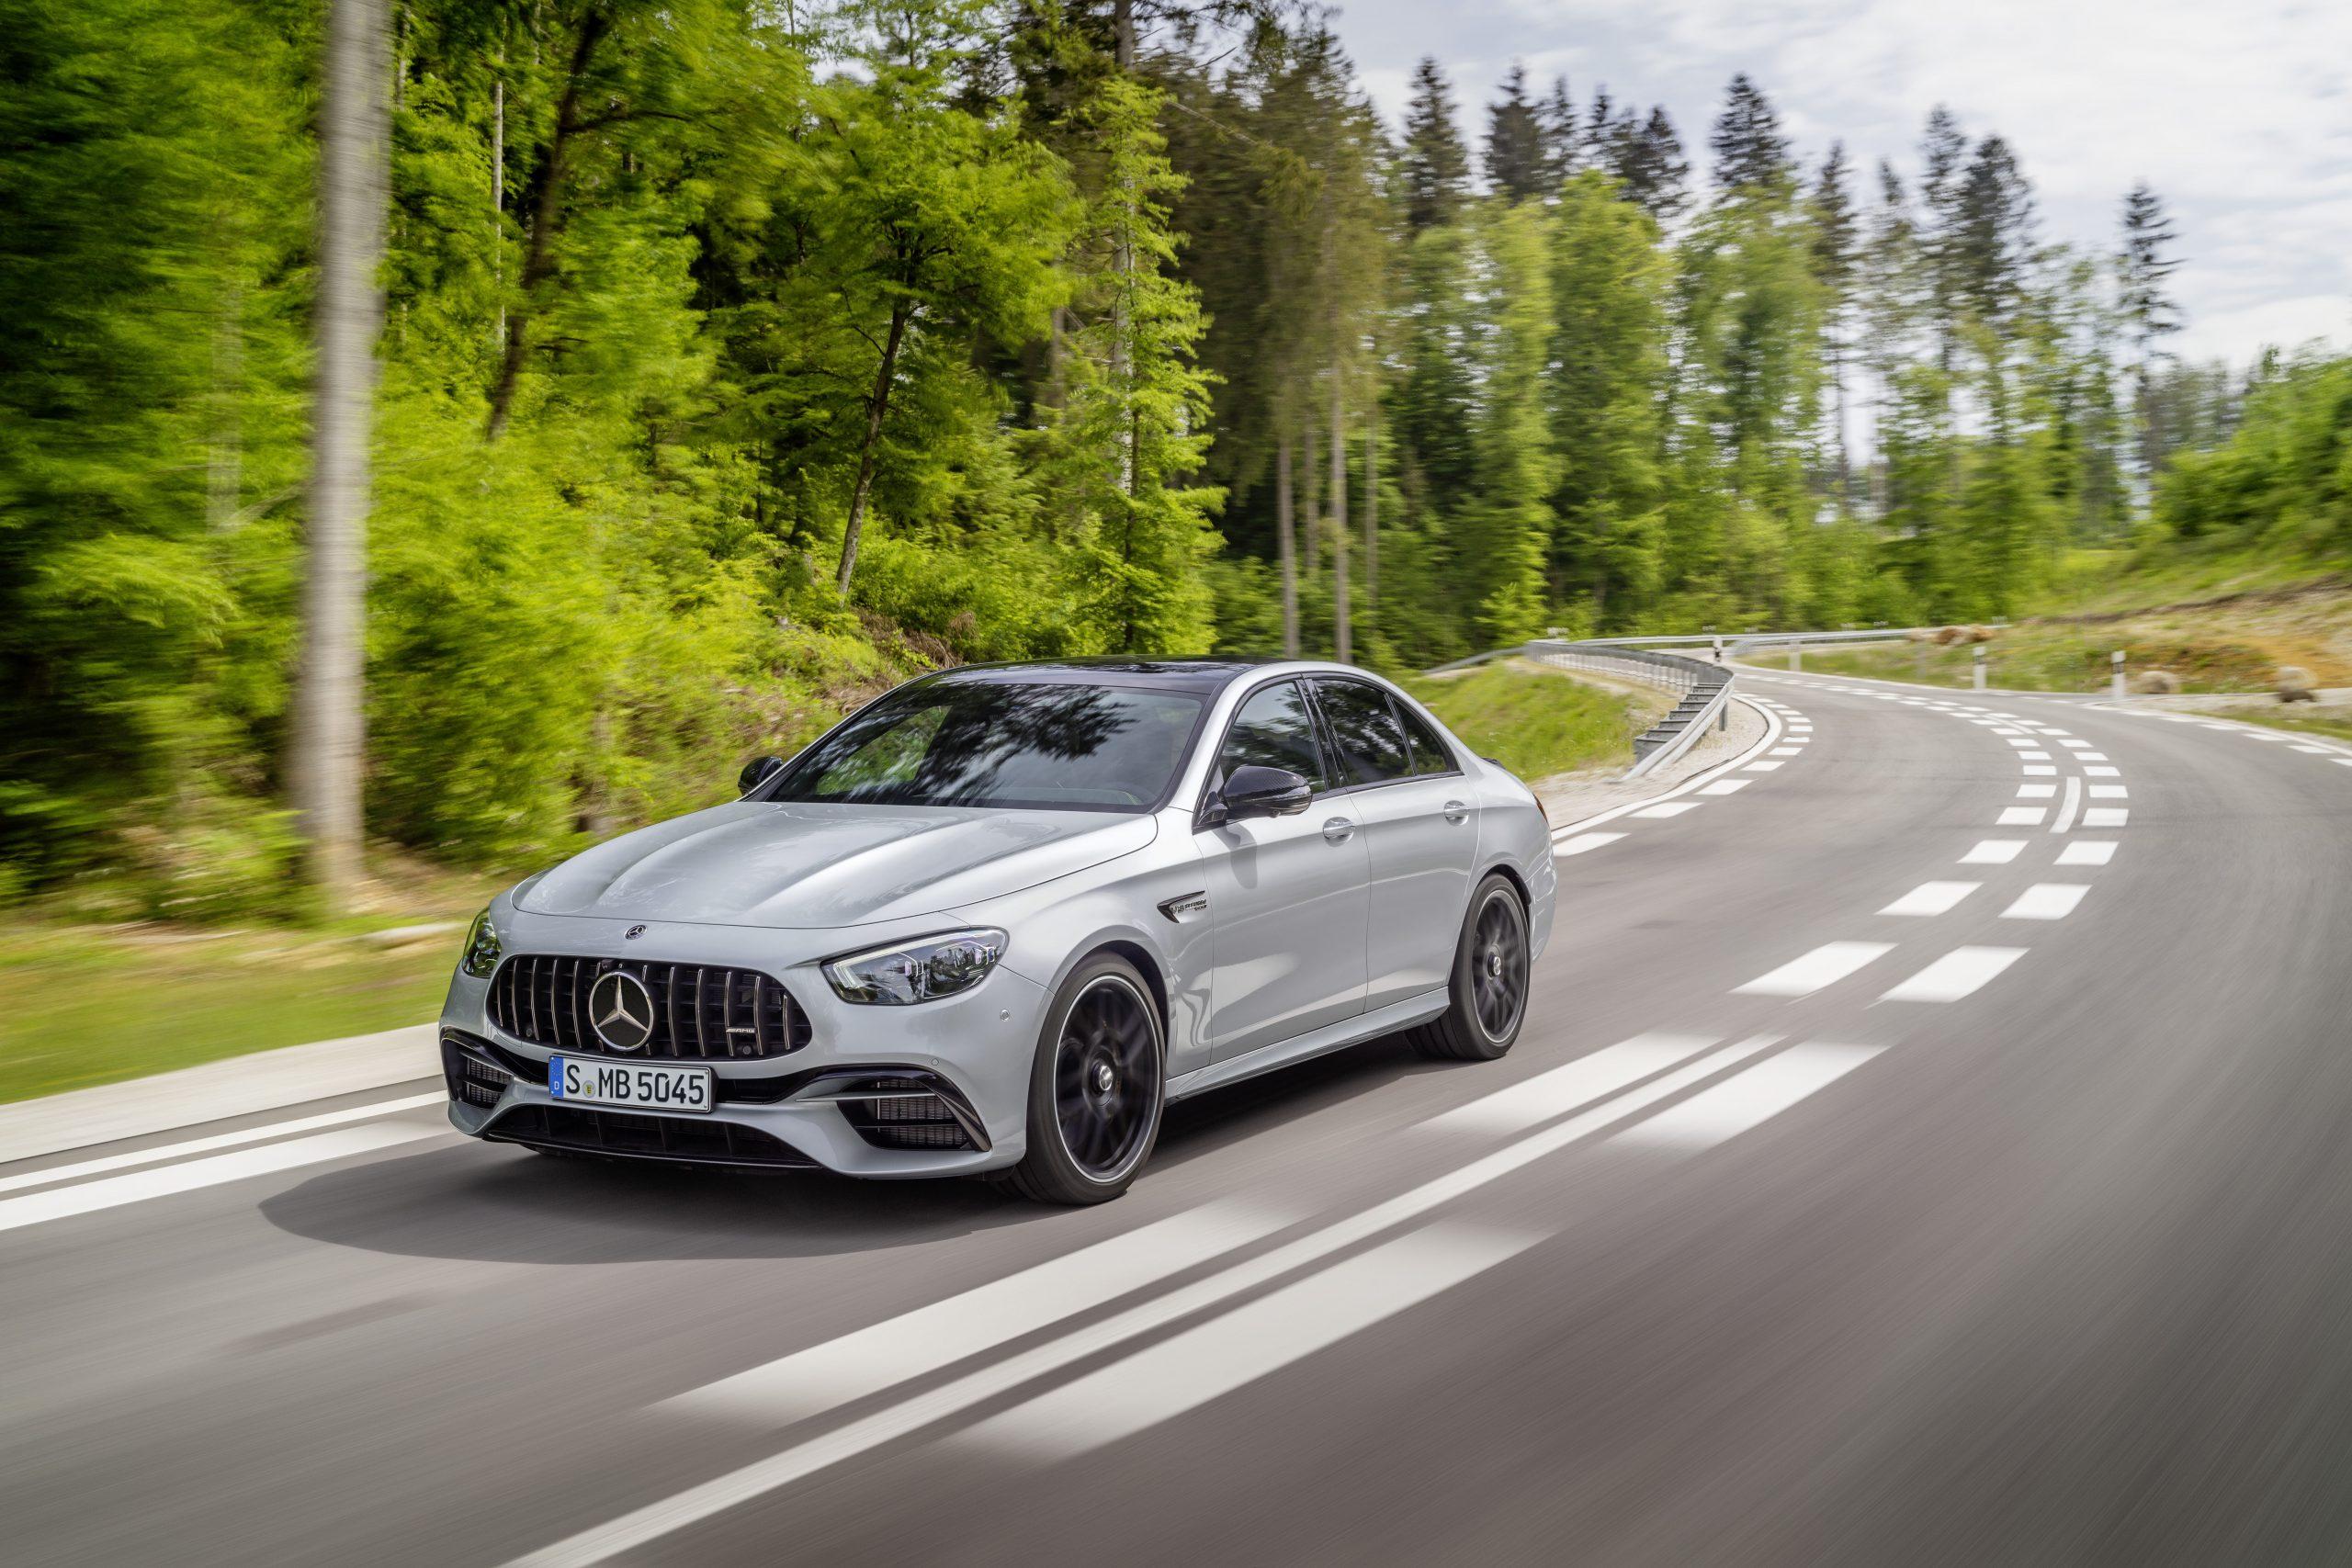 2021 Mercedes-AMG E63 S sedan front three quarter